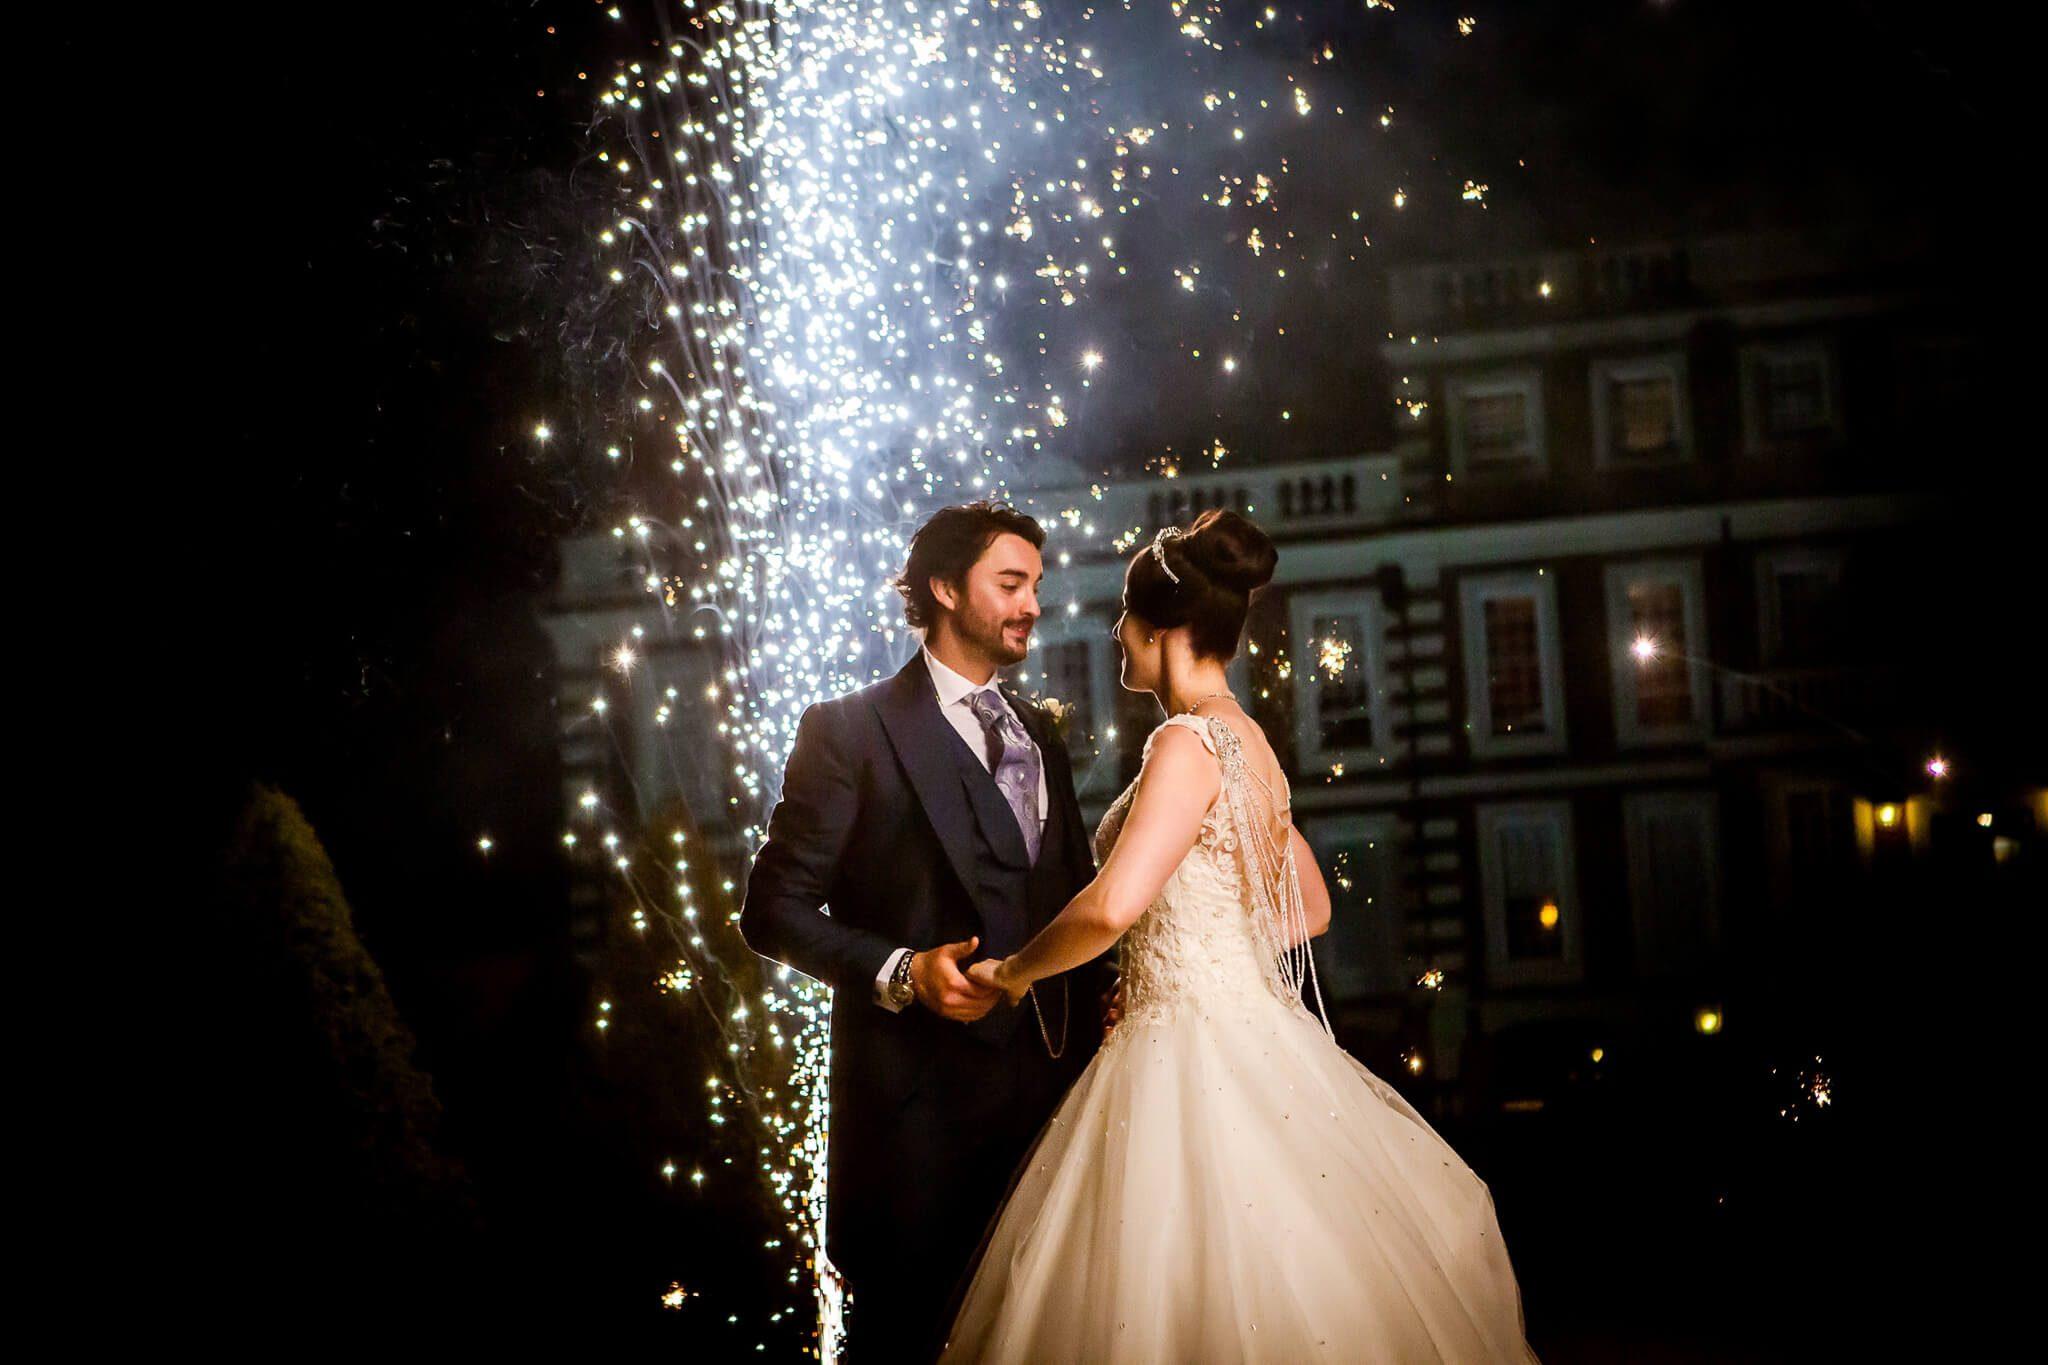 knowsley-hall-wedding-photographer-041